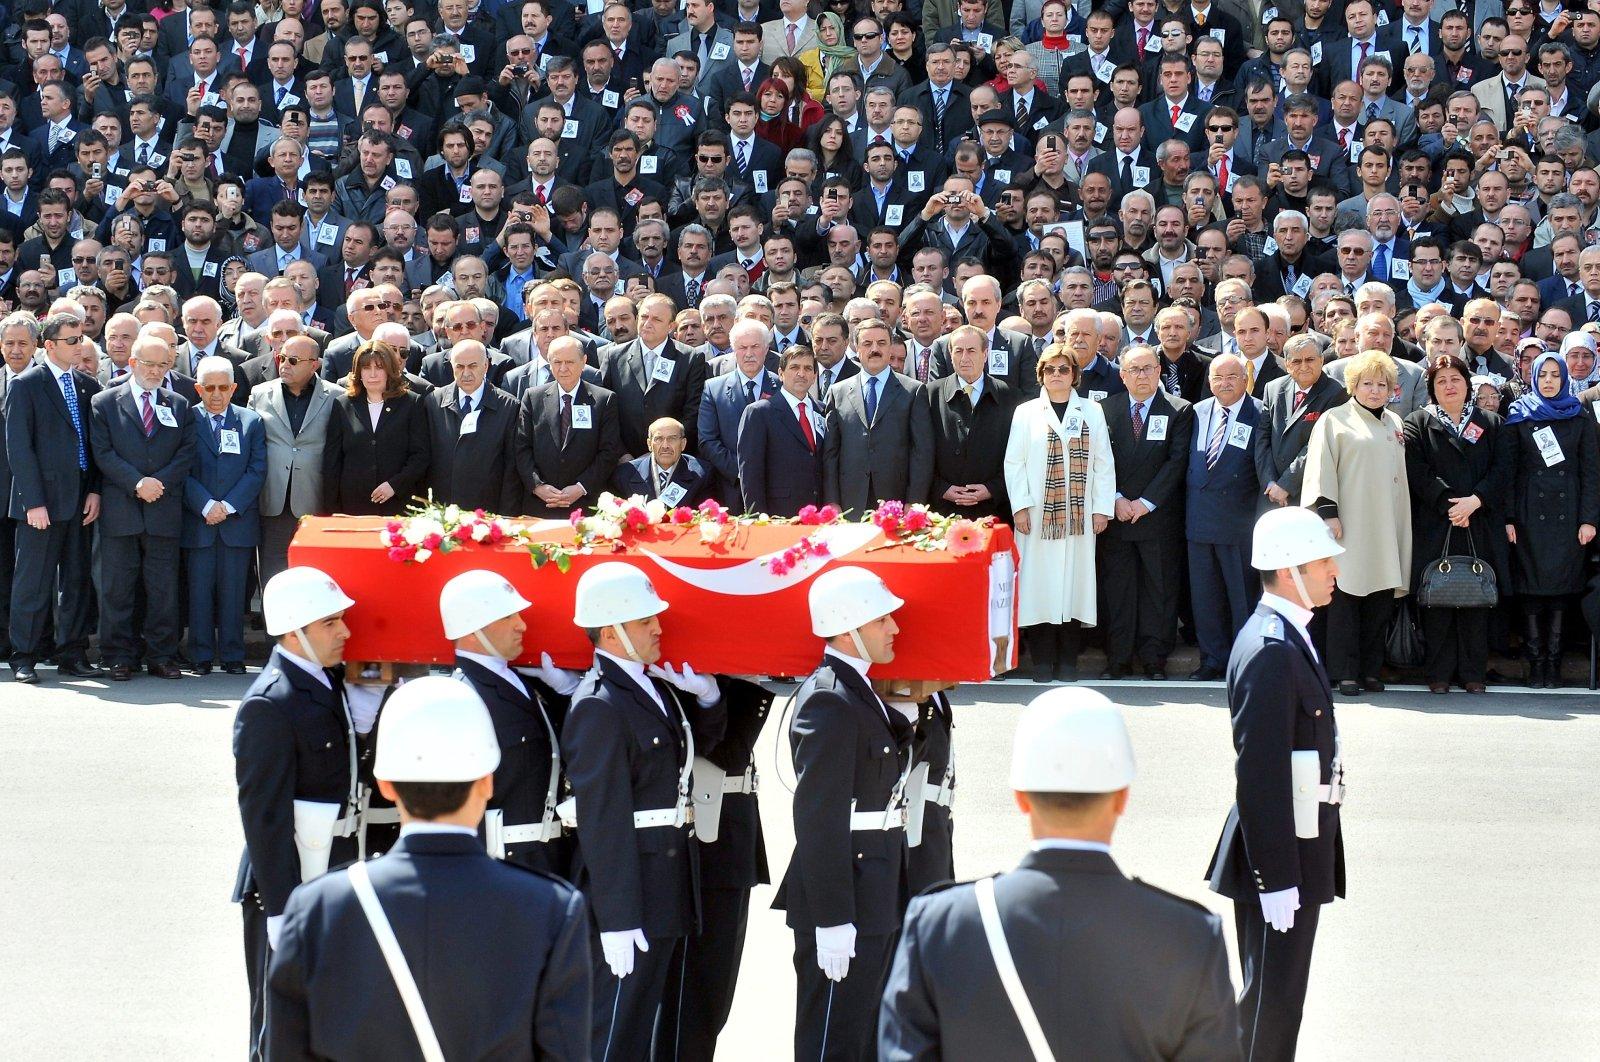 People attend Yazıcıoğlu's funeral at Parliament, in the capital Ankara, Turkey, Mar. 31, 2009. (AA Photo)